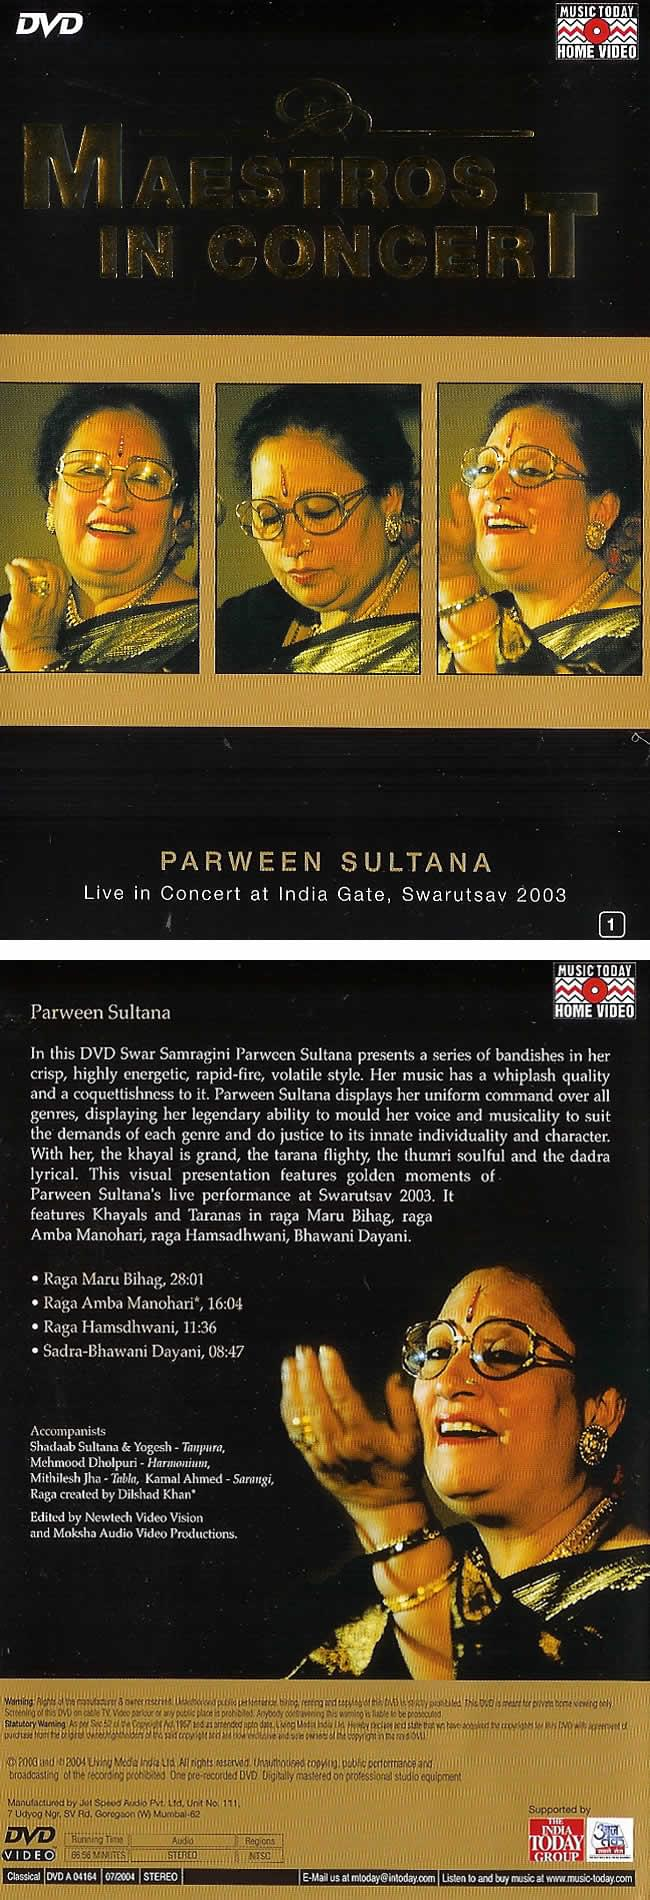 MAESTROS IN CONCERT vol.1 - PARWEEN SULTANA [DVD]の写真1